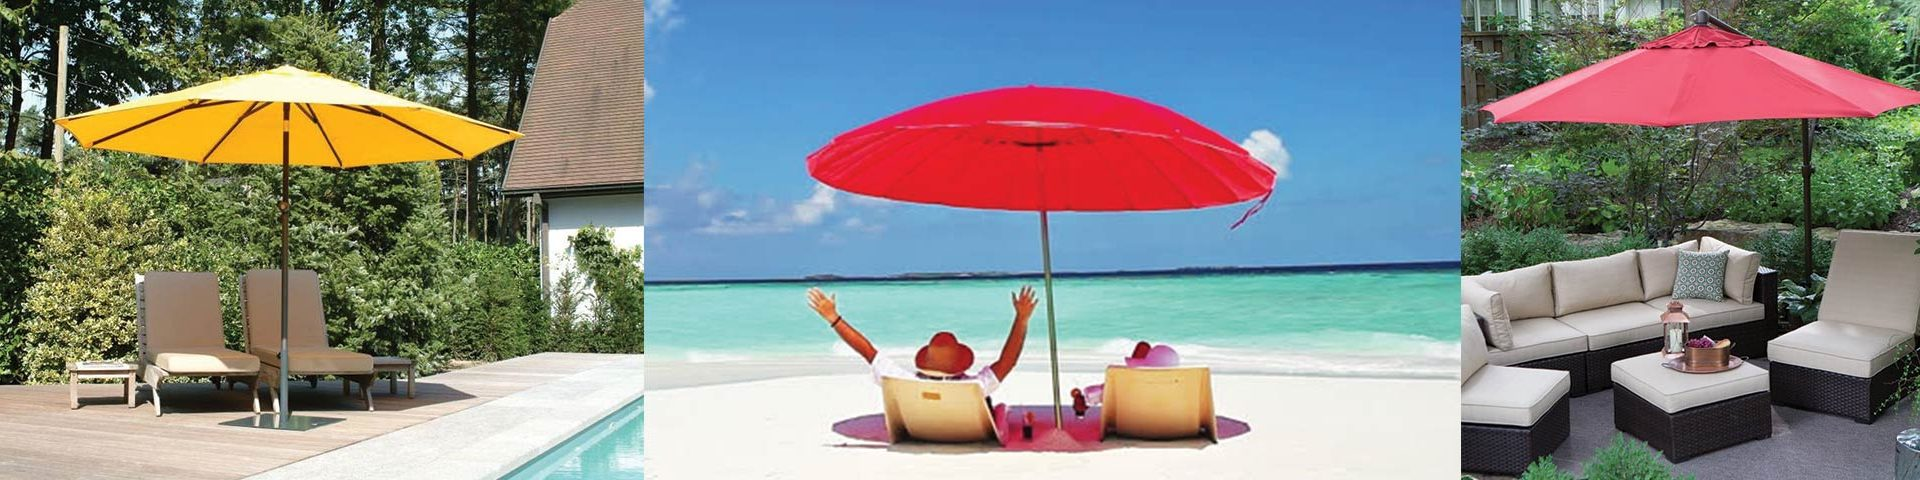 parasol impregneren, parasol waterdicht maken, zonnescherm impregneren, zonnescherm waterdicht maken, parasol waterafstotend maken, zonnescherm waterafstotend maken